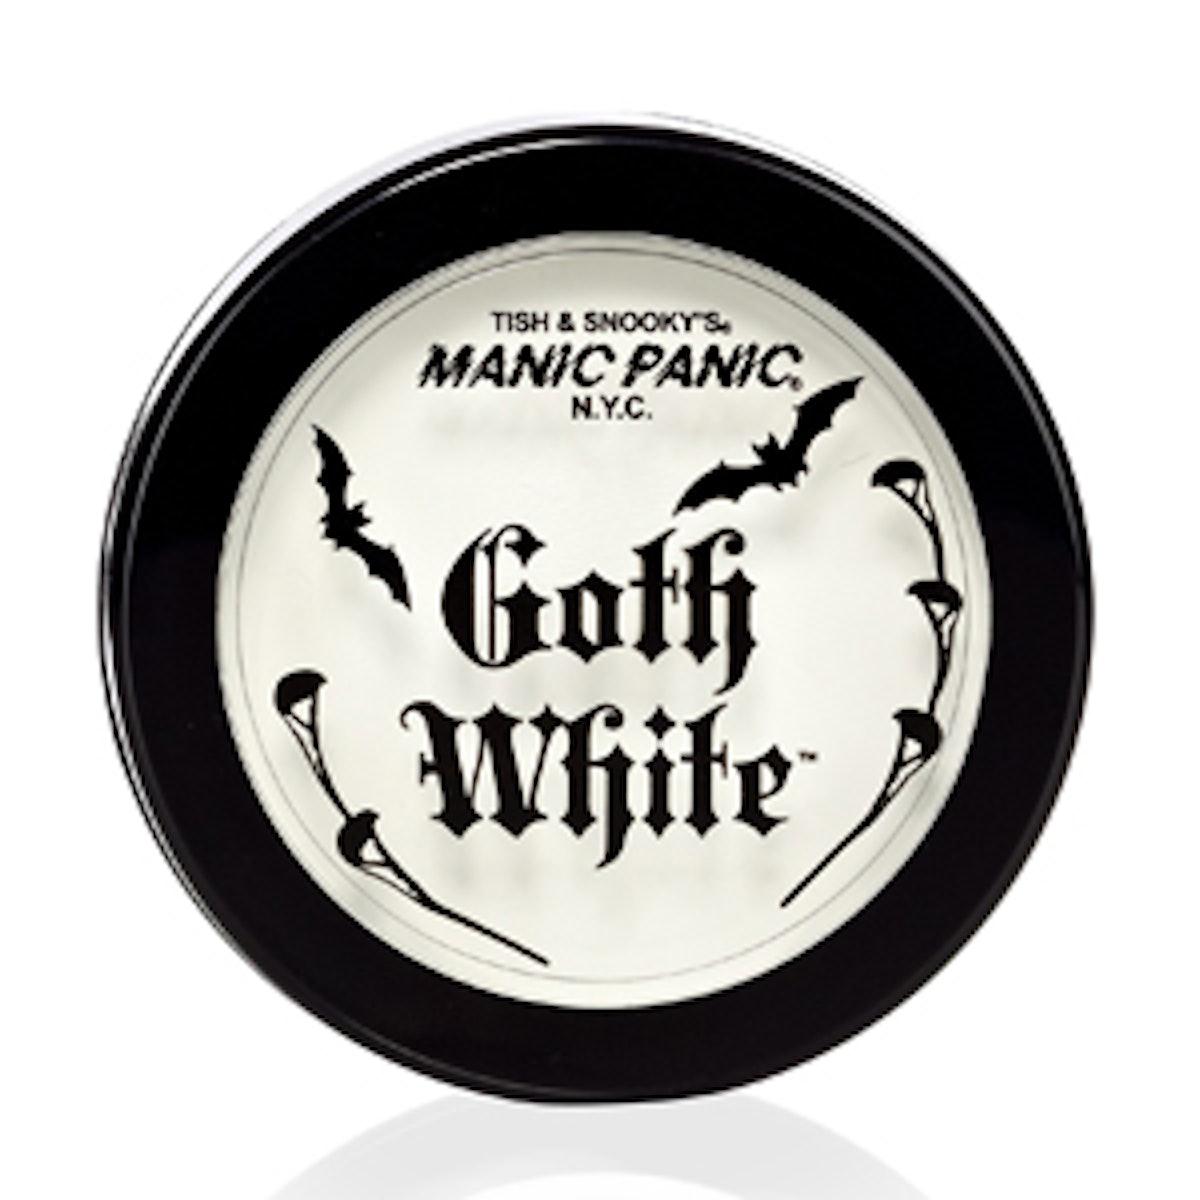 Goth White Cream Powder Foundation